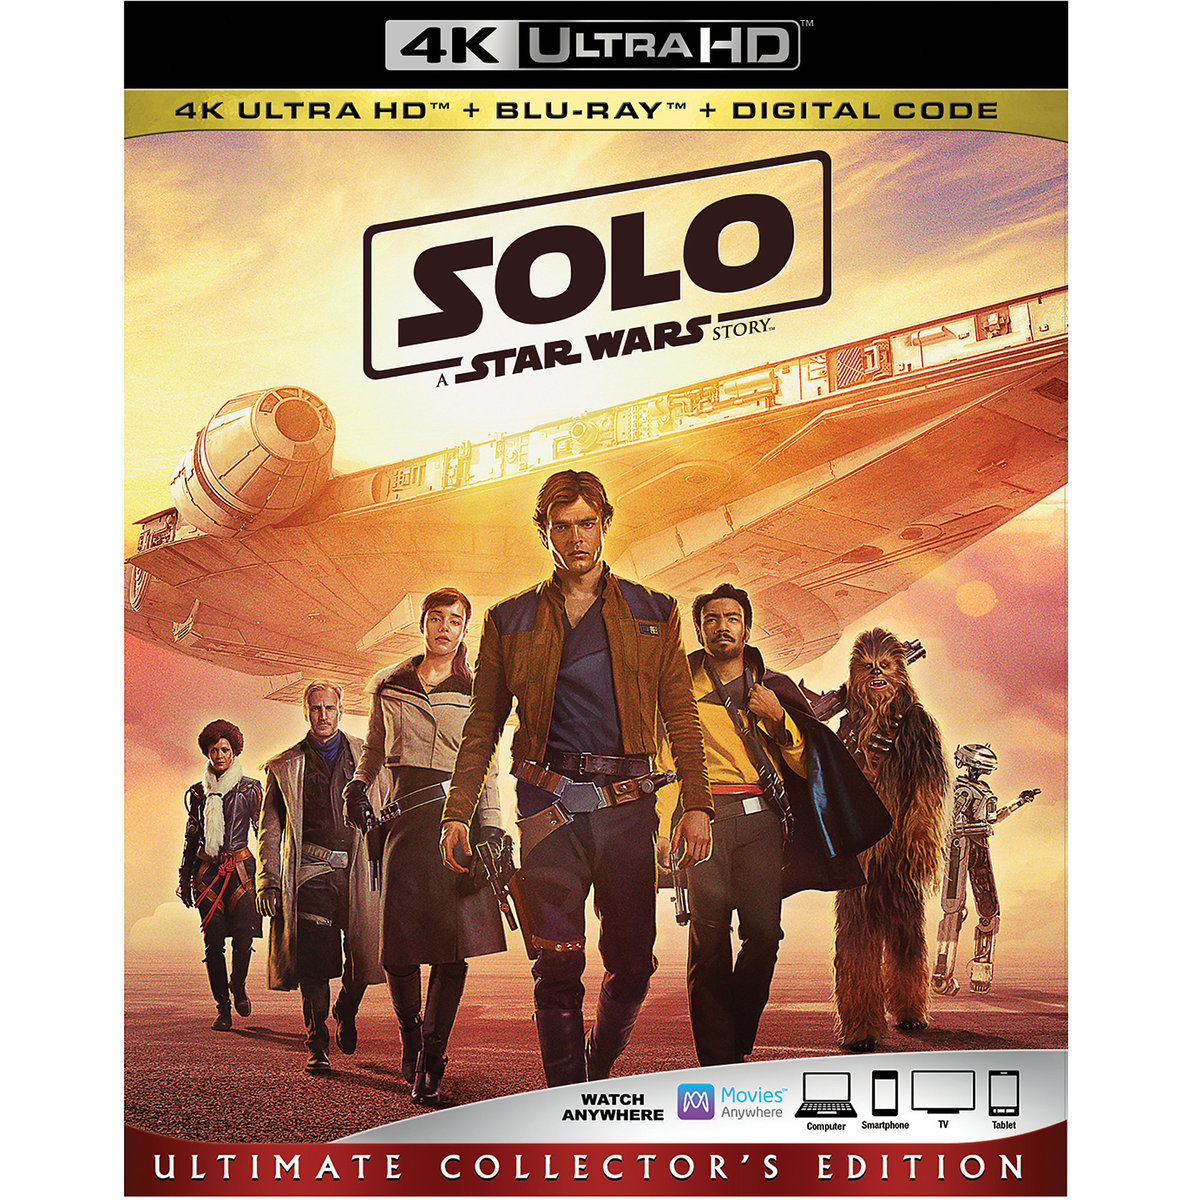 Solo: A Star Wars Story Blu-ray 4K Ultra HD